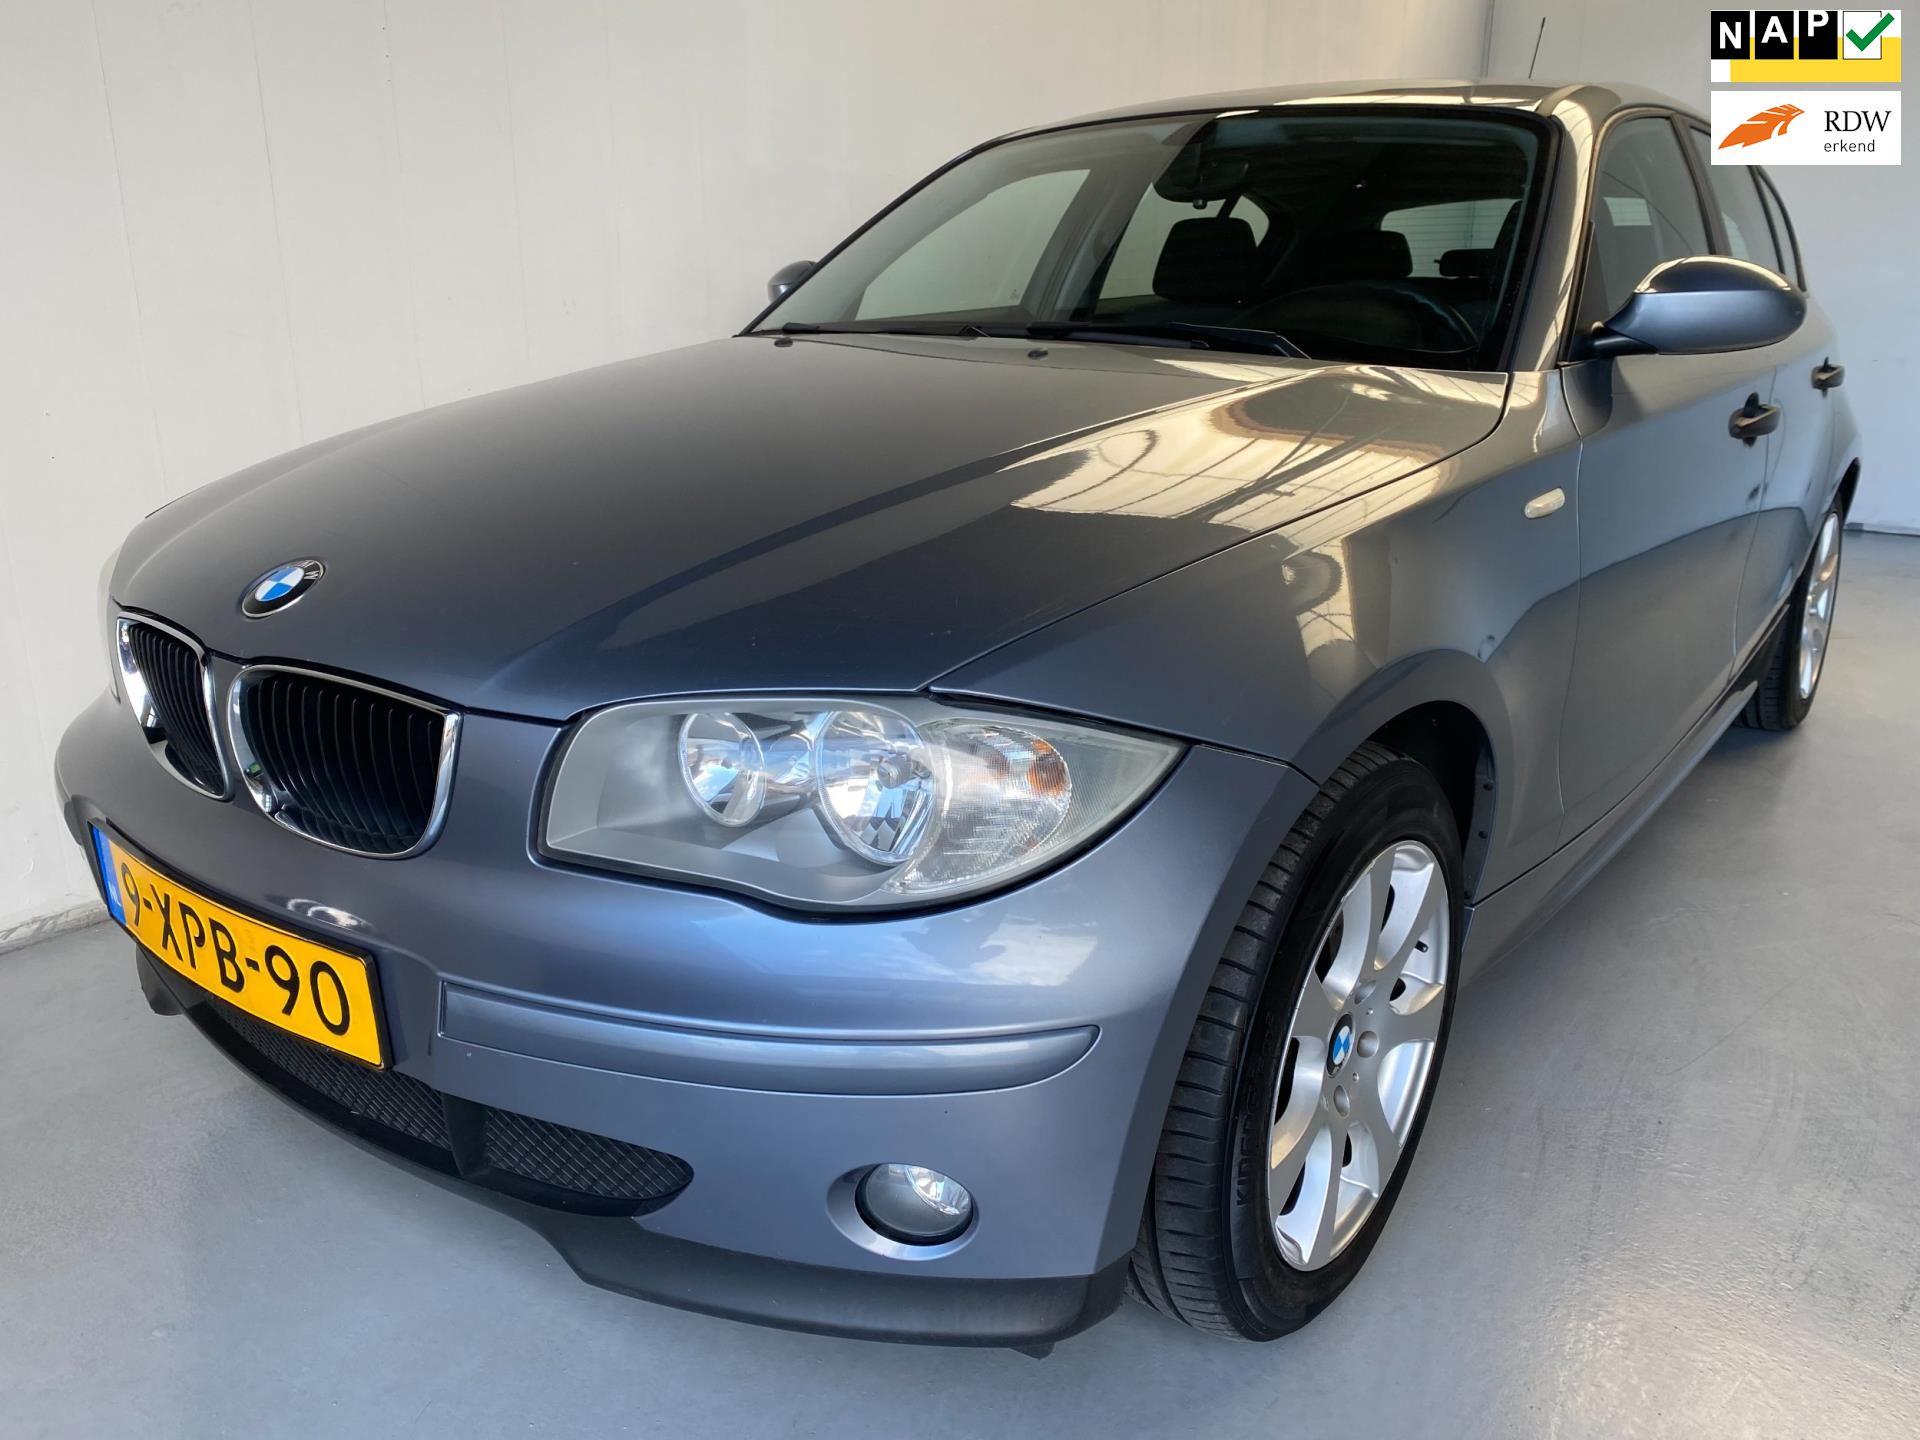 BMW 1-serie occasion - Autobedrijf Leeuwis B.V.